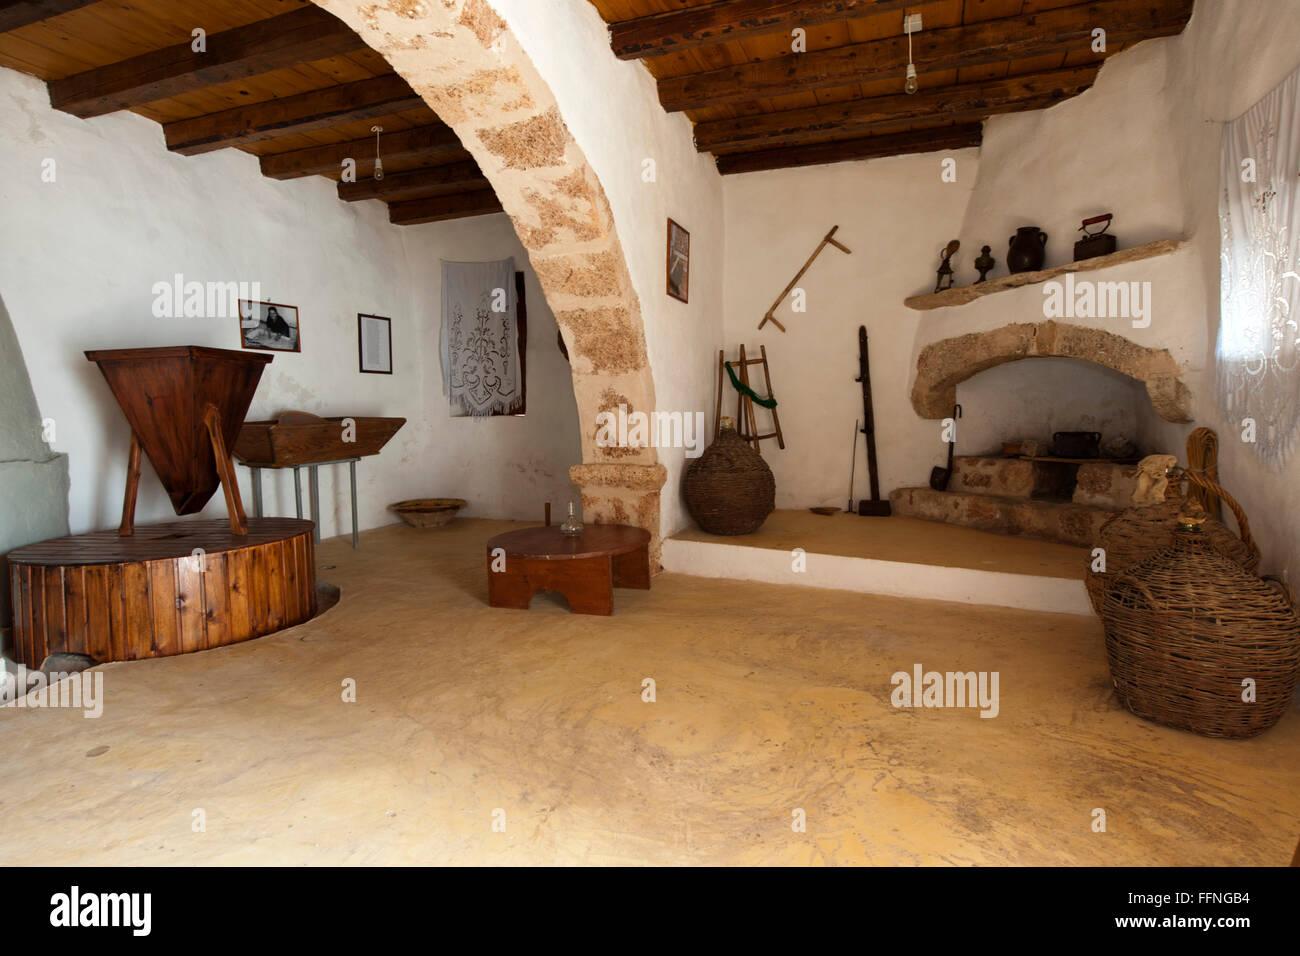 Griechenland, Kreta, Zakros, Wassermühle - Stock Image